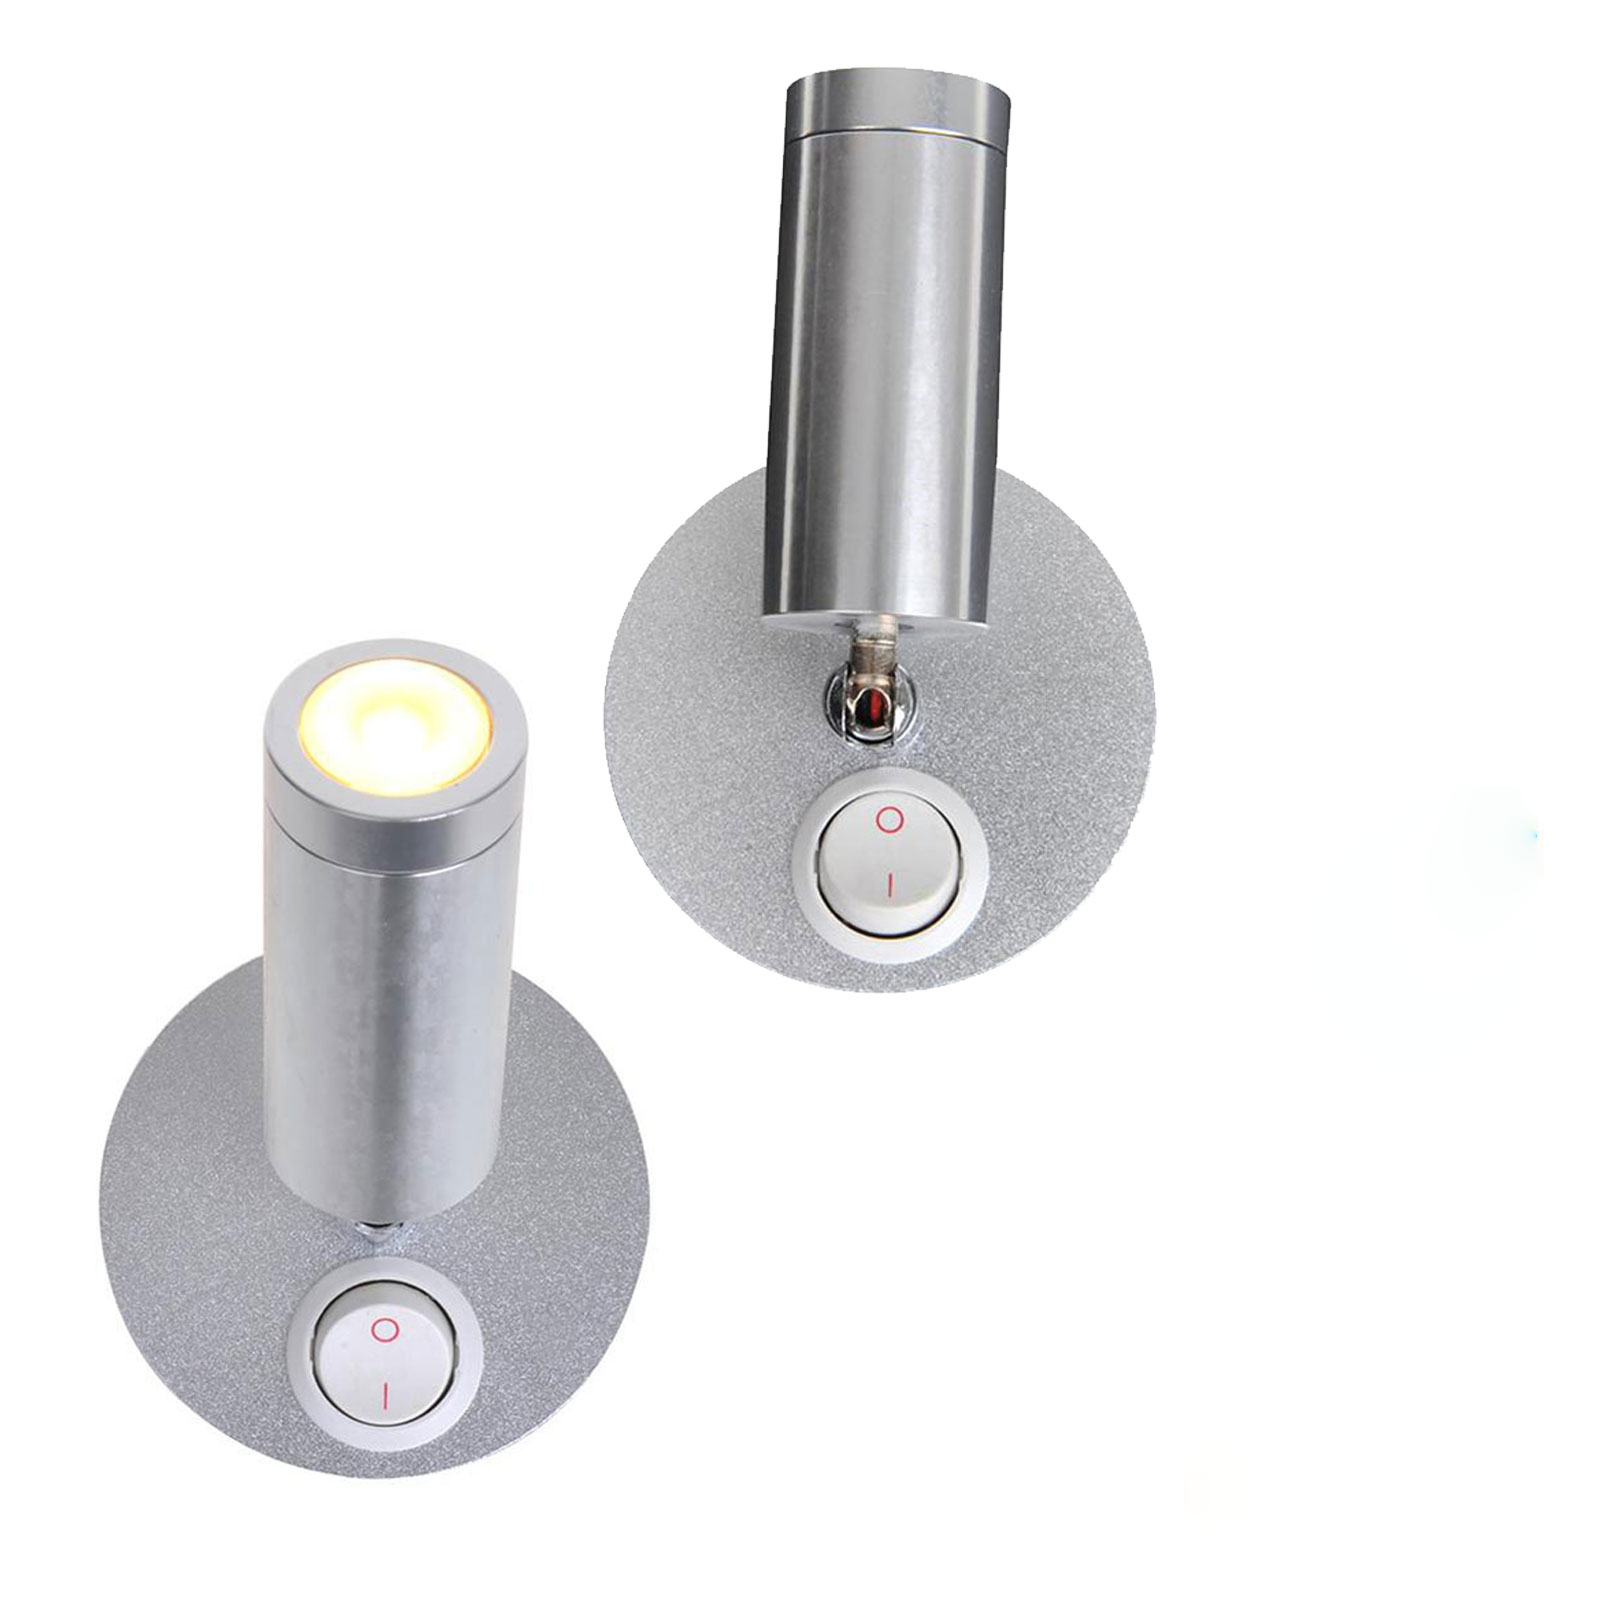 2er Set Aufbauspot 1 LED schwenkbar 12v, 120lm, Ø65x65-130mm